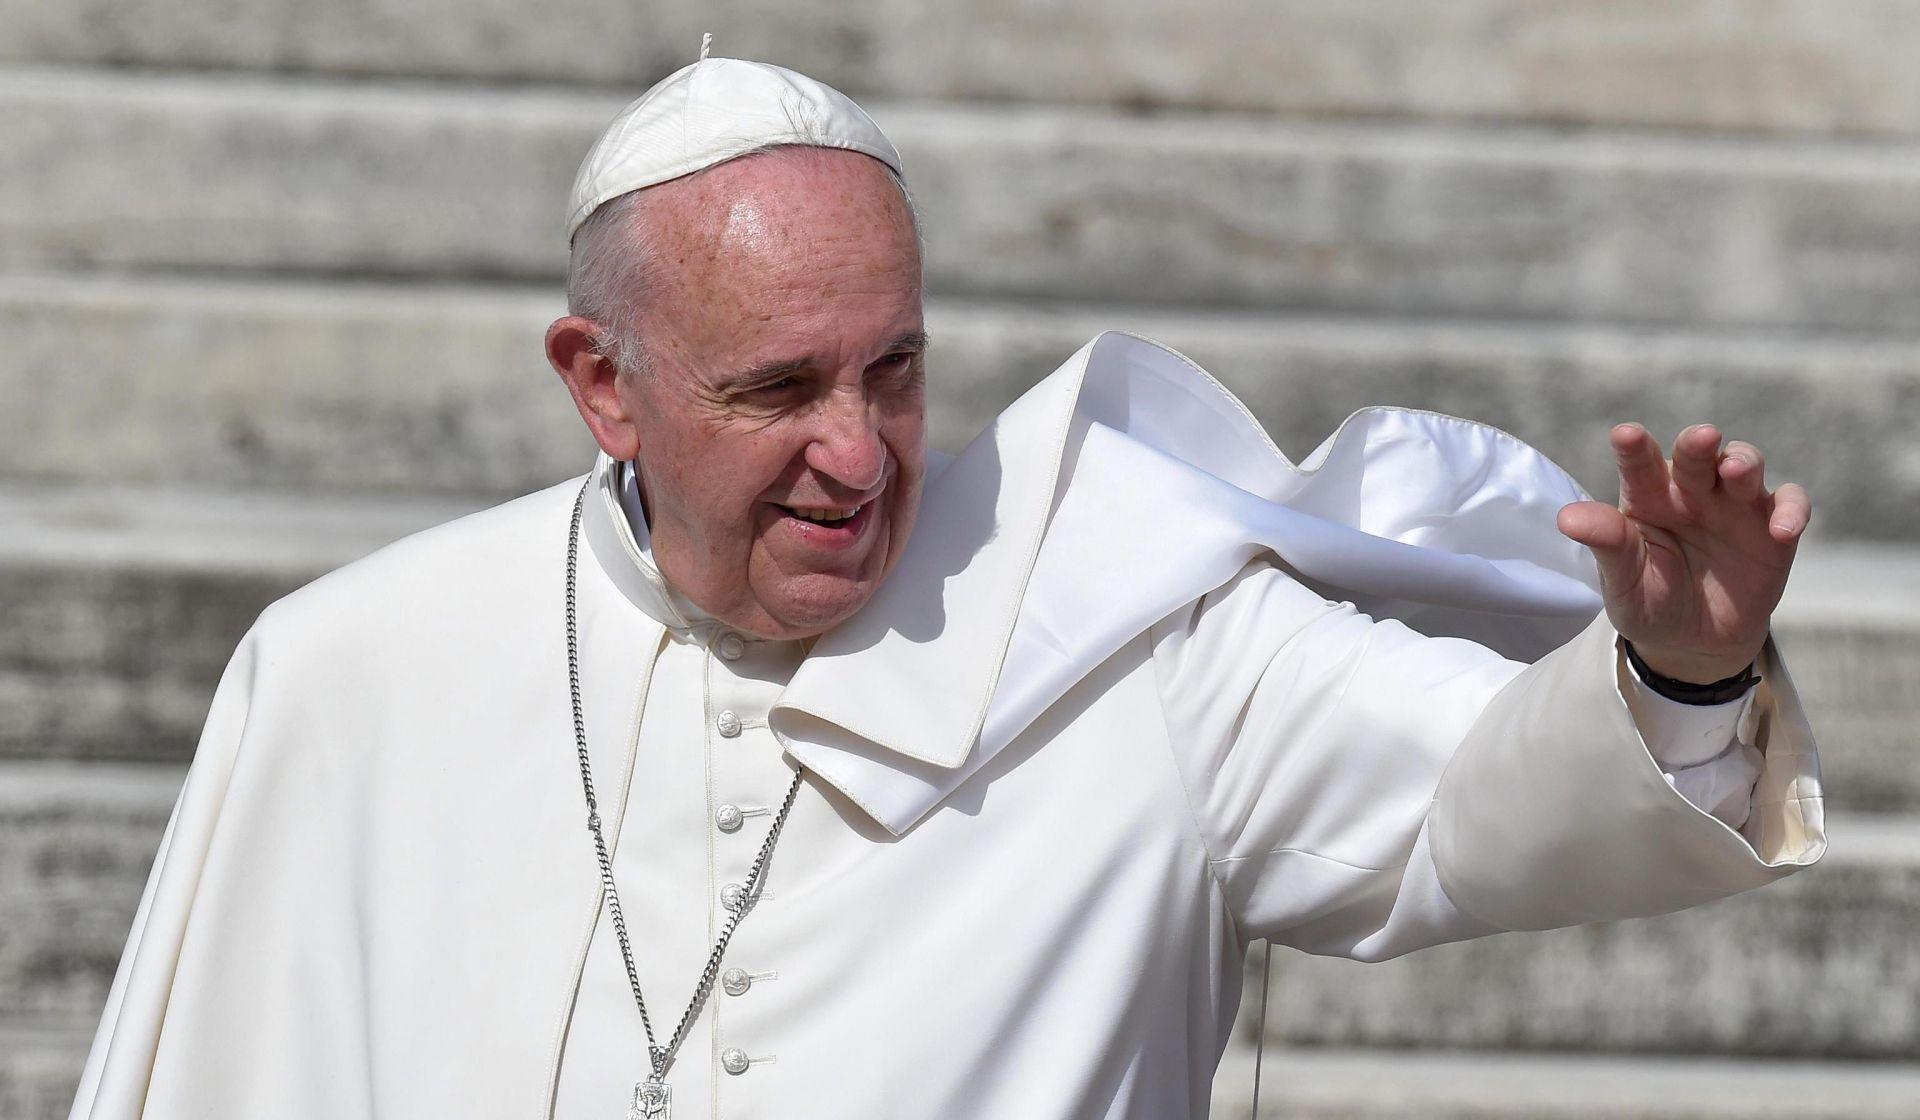 PRVA FILMSKA ULOGA Papa Franjo u obiteljskoj avanturi glumit će samog sebe